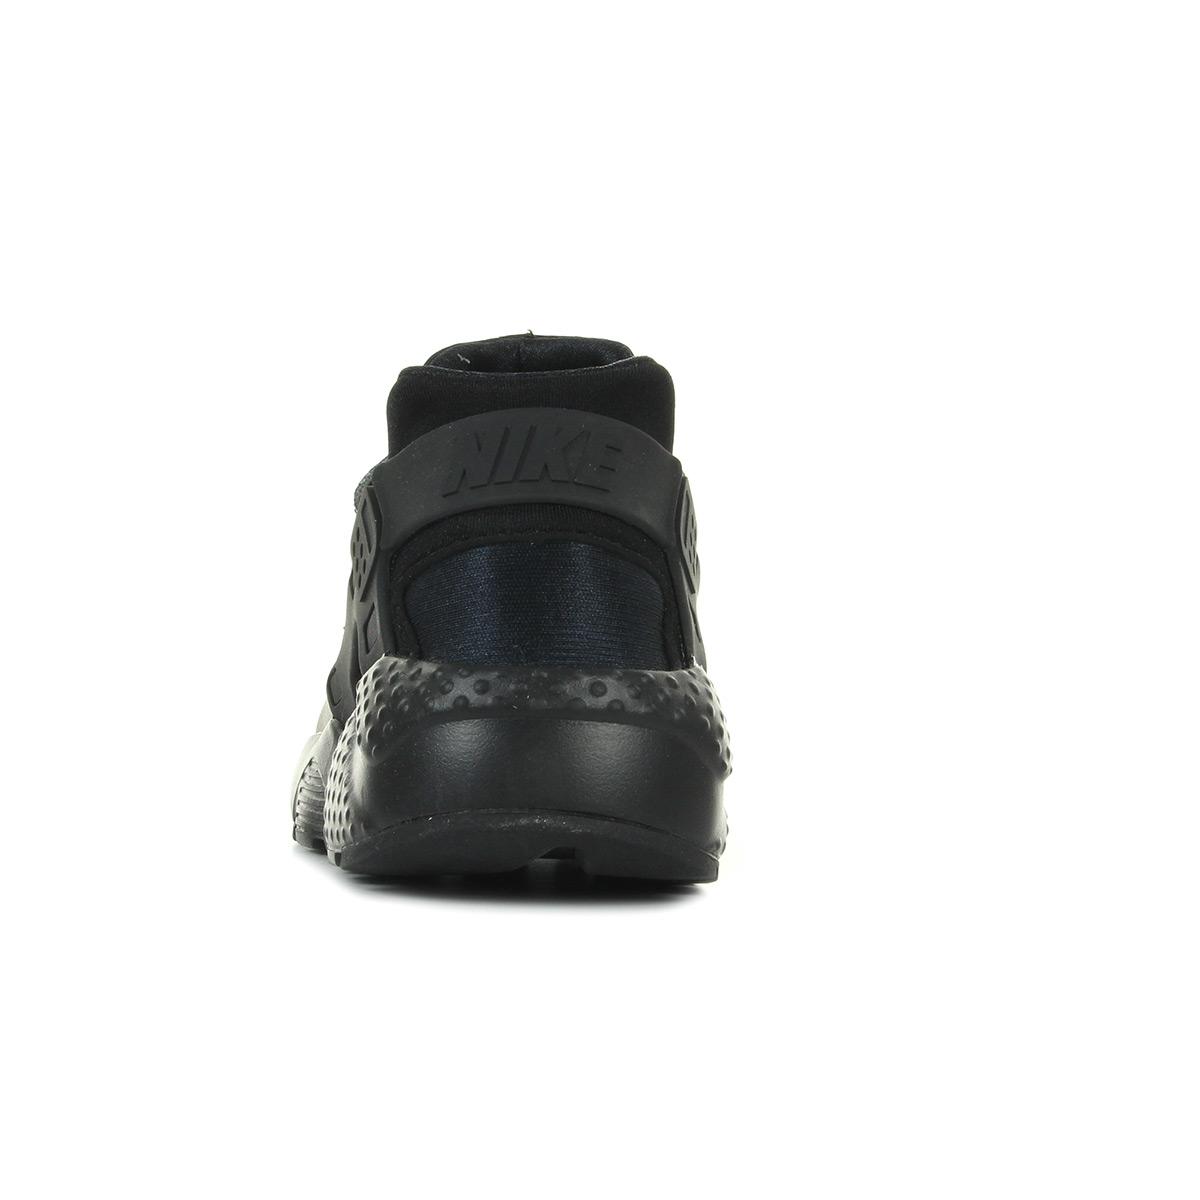 Huarache Mode Femme Run Nike 654275016Baskets bf7g6IvYym